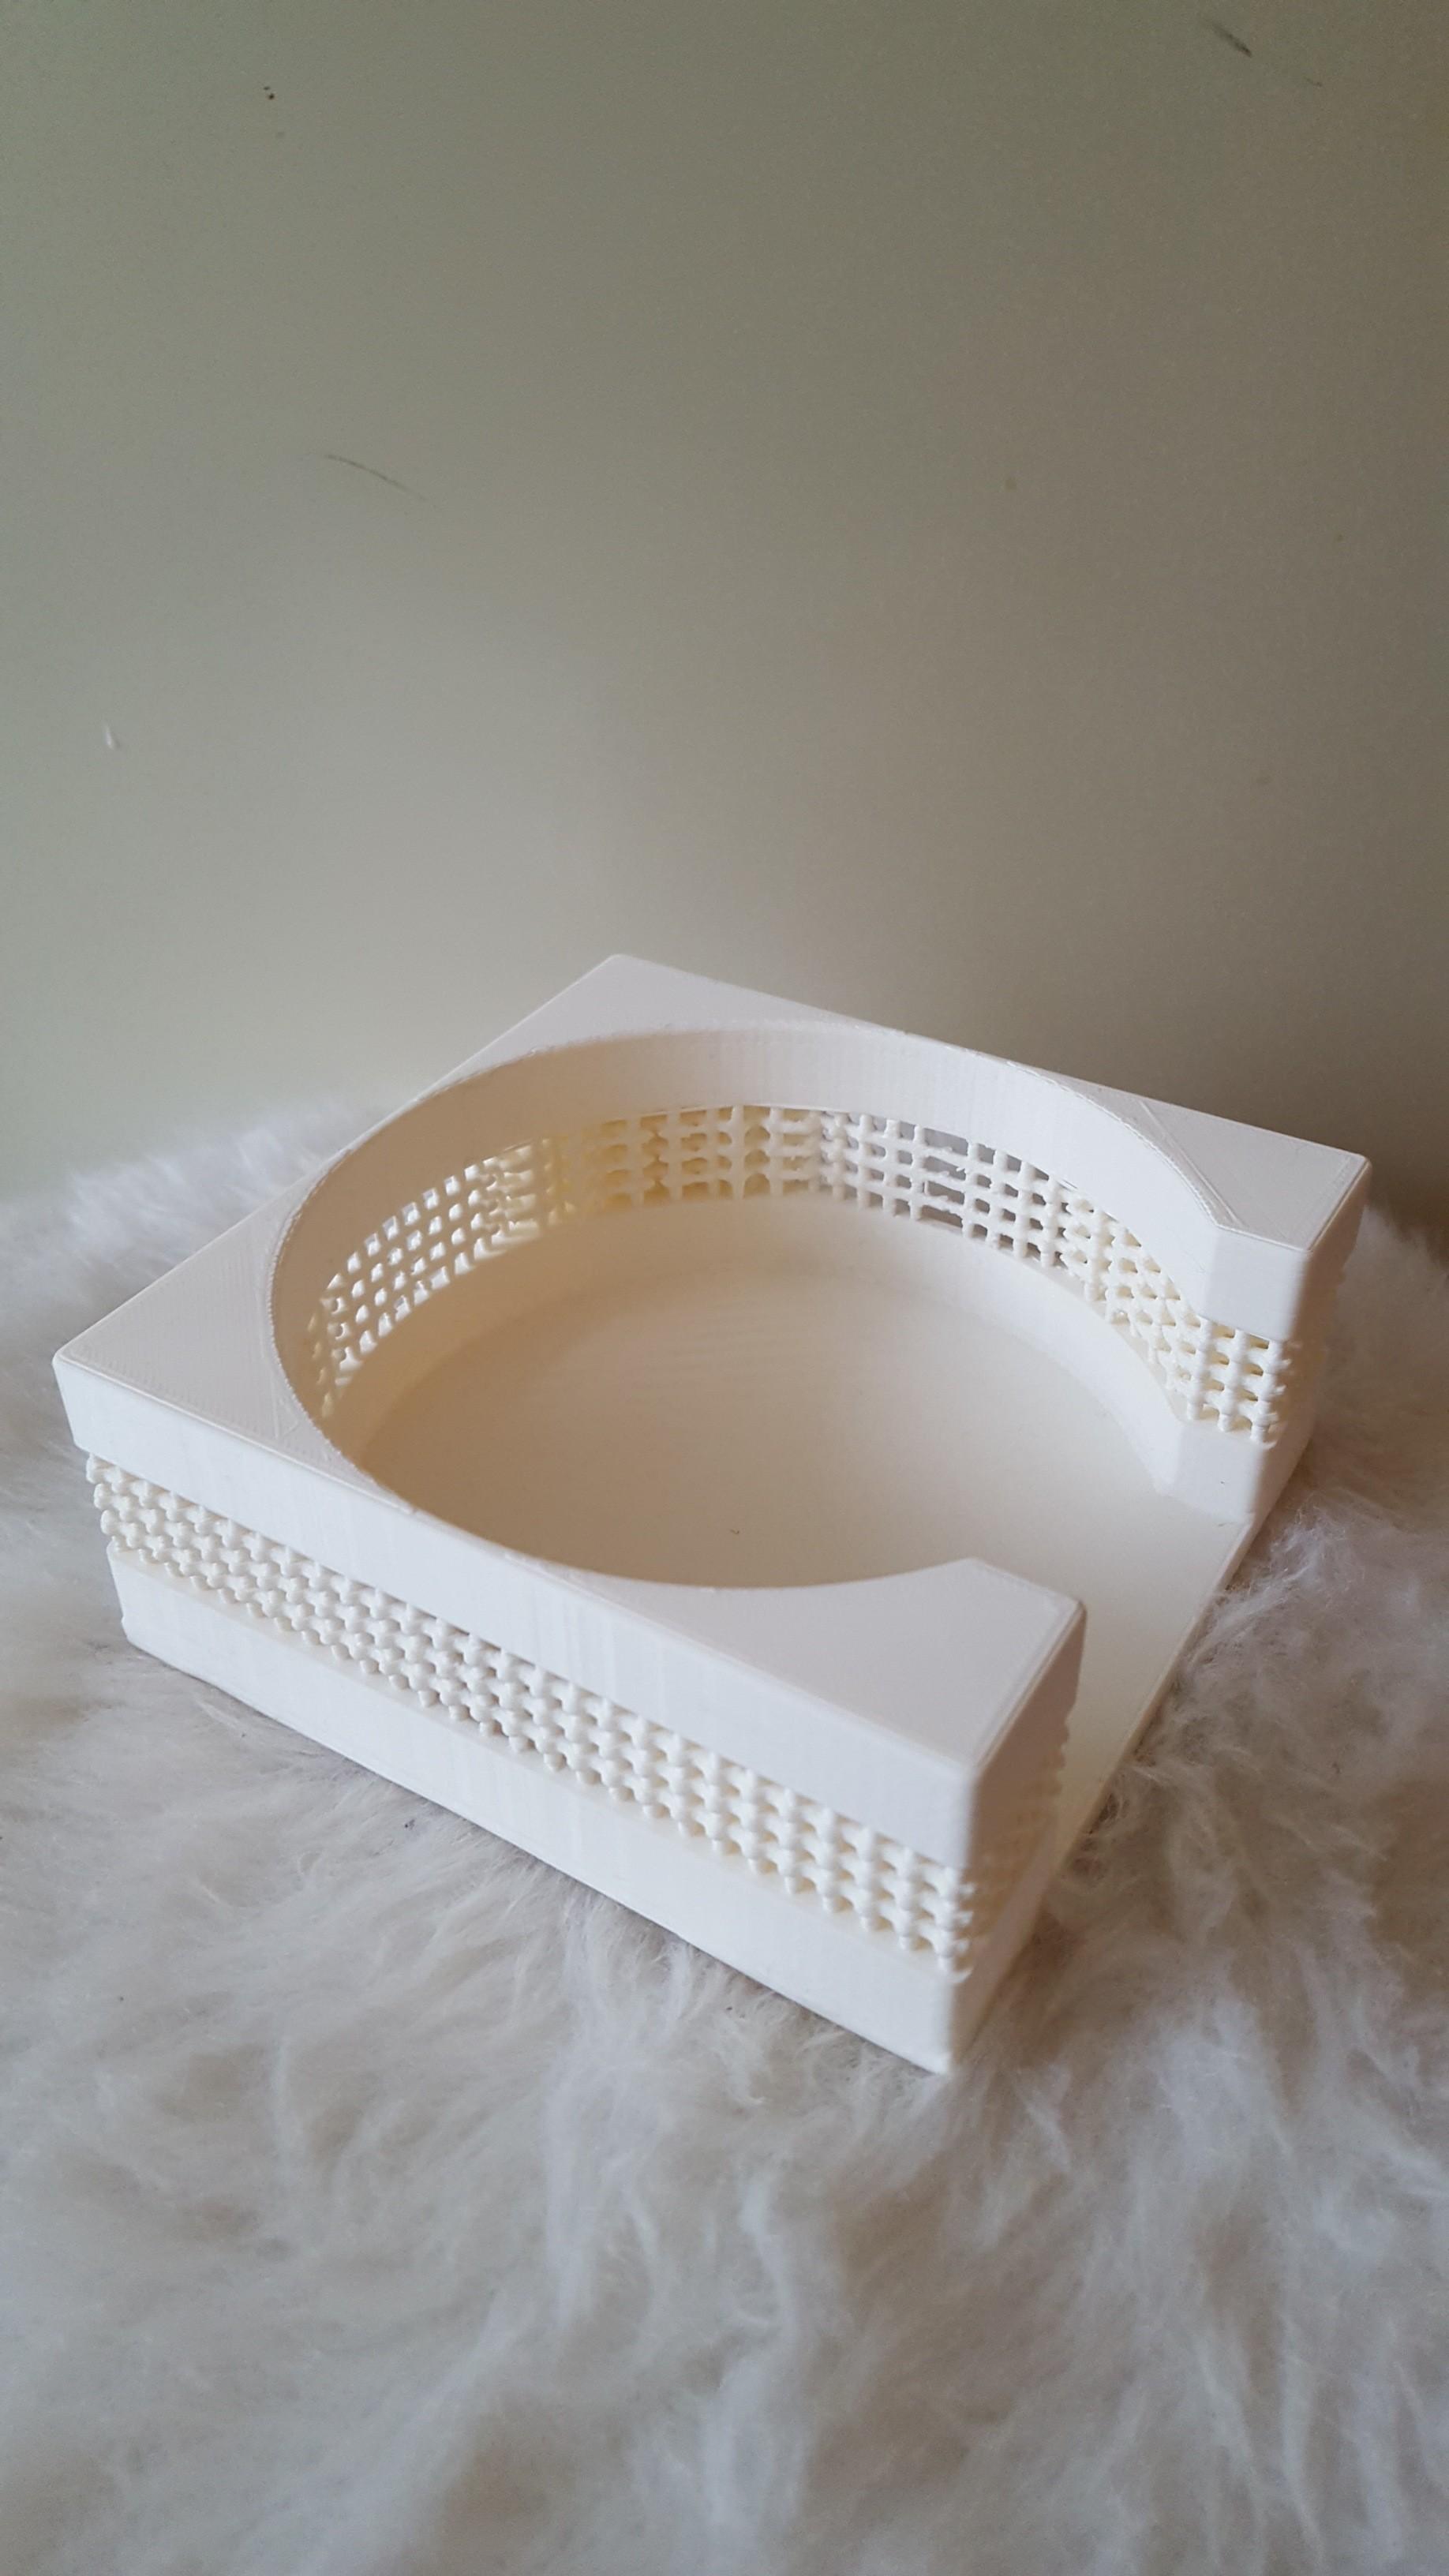 20190407_191320.jpg Download free STL file Coasterholder lattice pattern • 3D printer template, IdeaLab